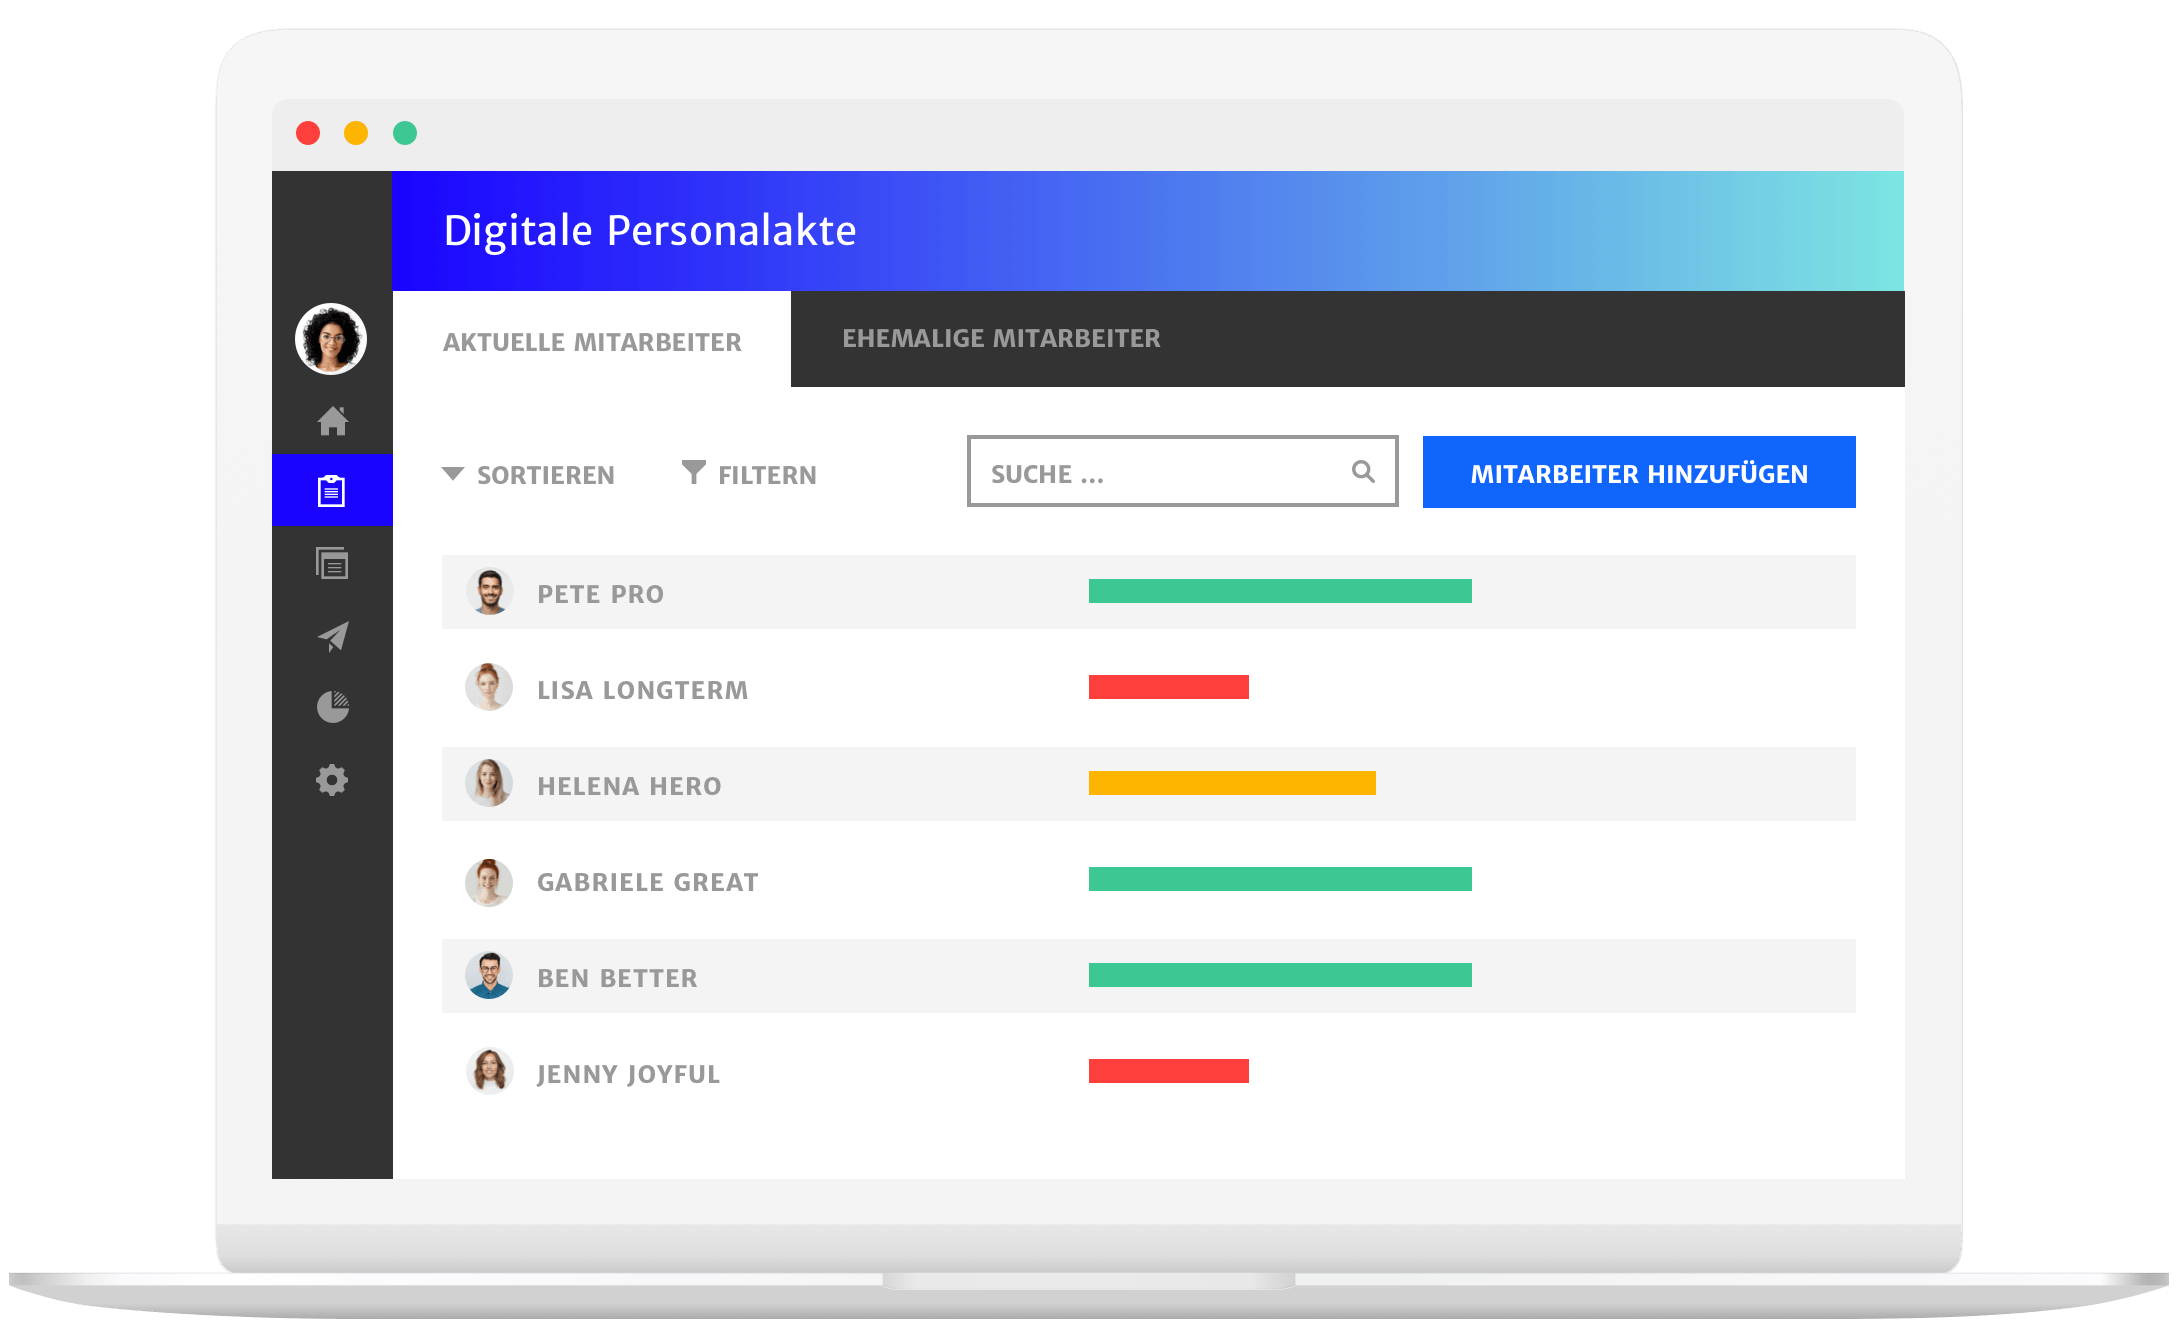 Digitale Personalakte in Haufe People Operations